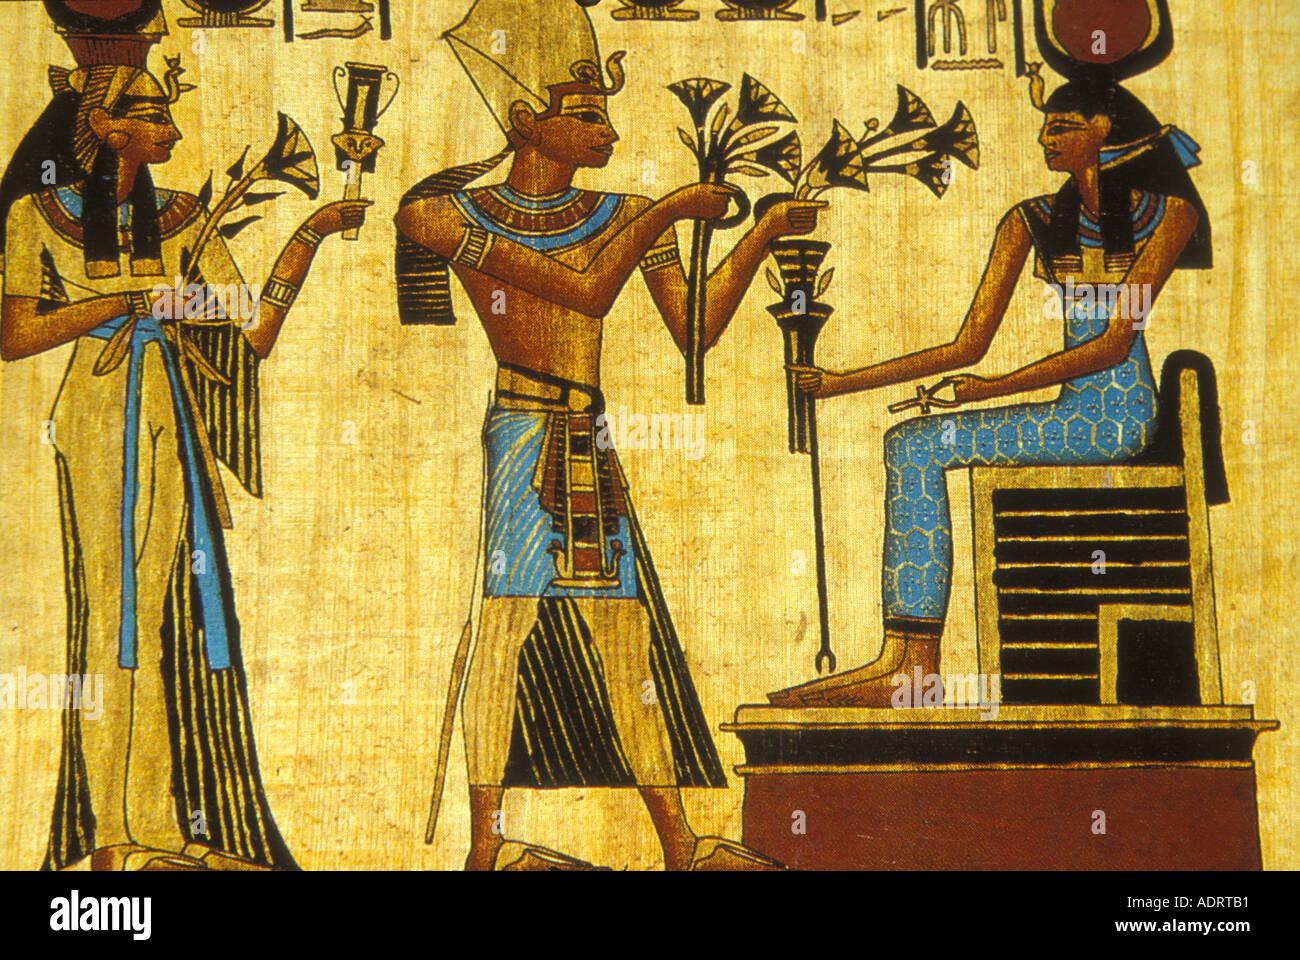 Egypt ramses ii offers lotus flowers to queen nefertiti for Mural egipcio